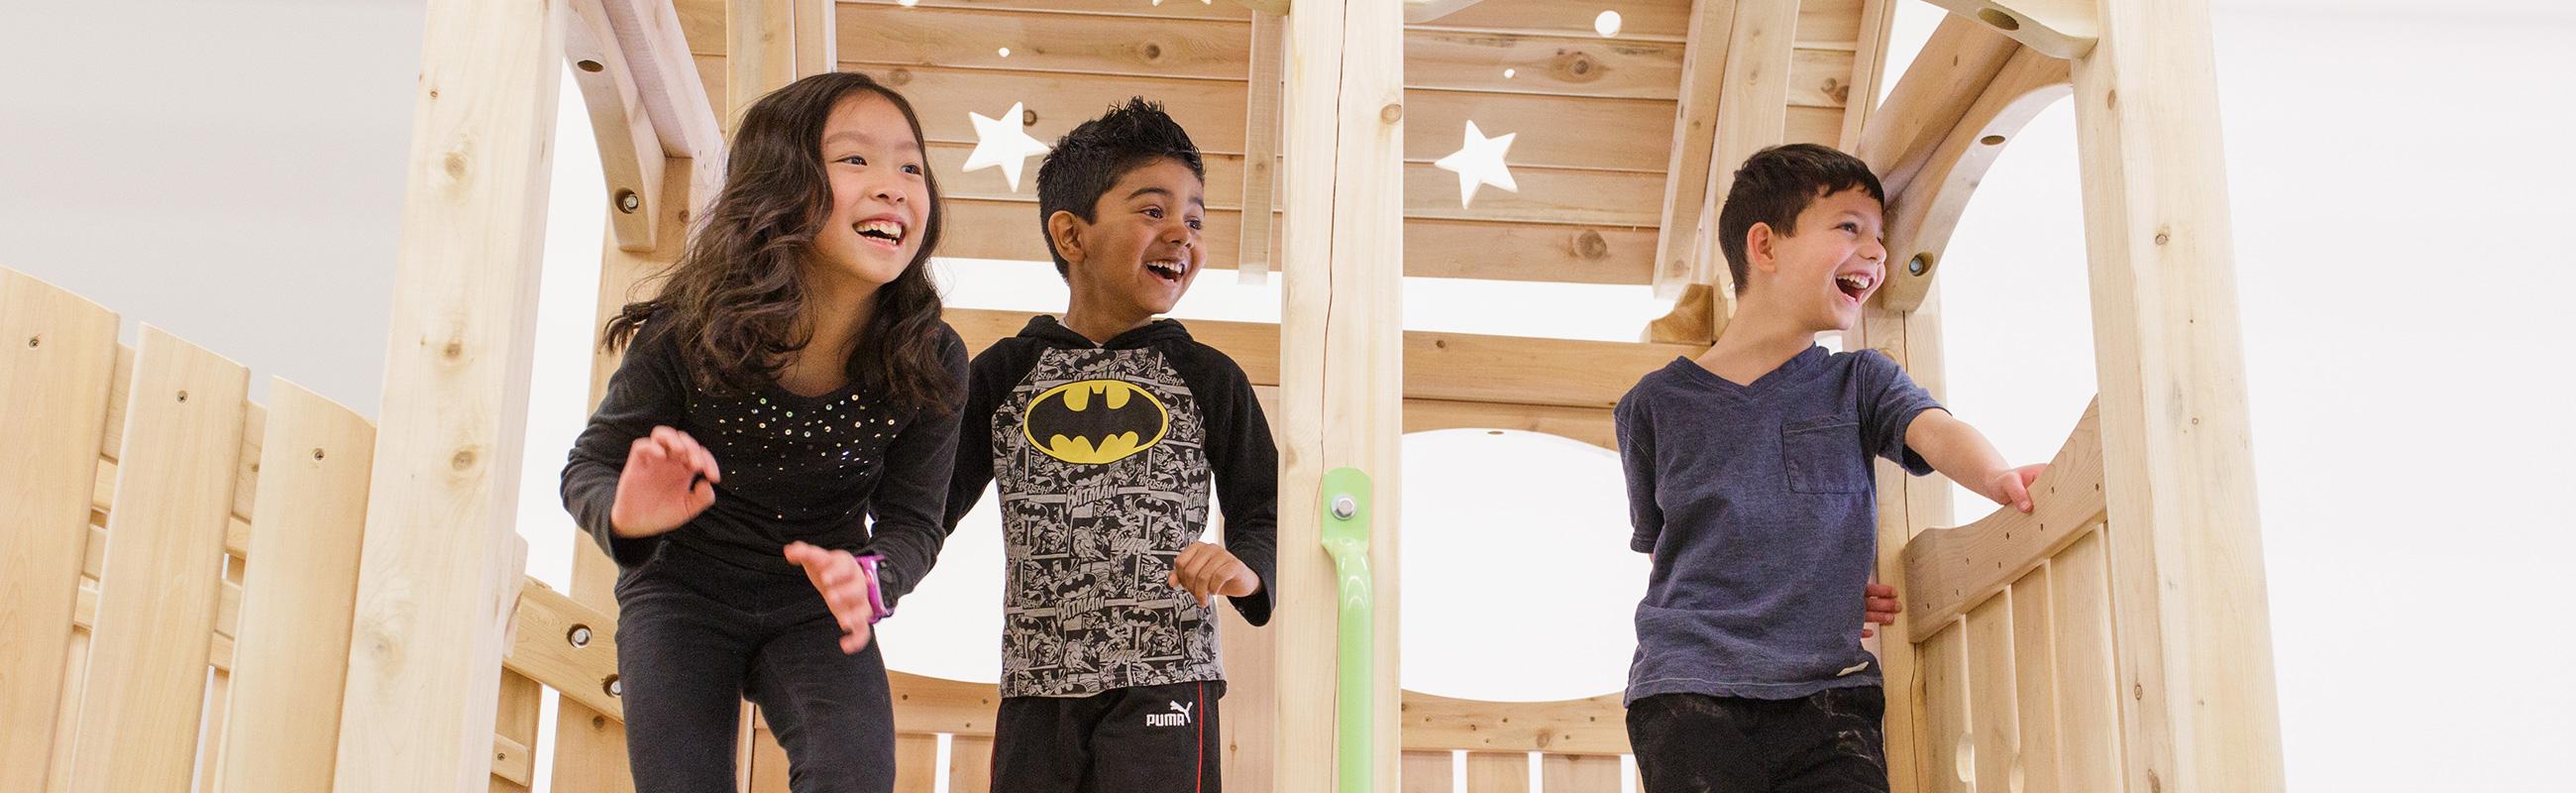 Inclusive indoor sensory processing play, south surrey, british columbia